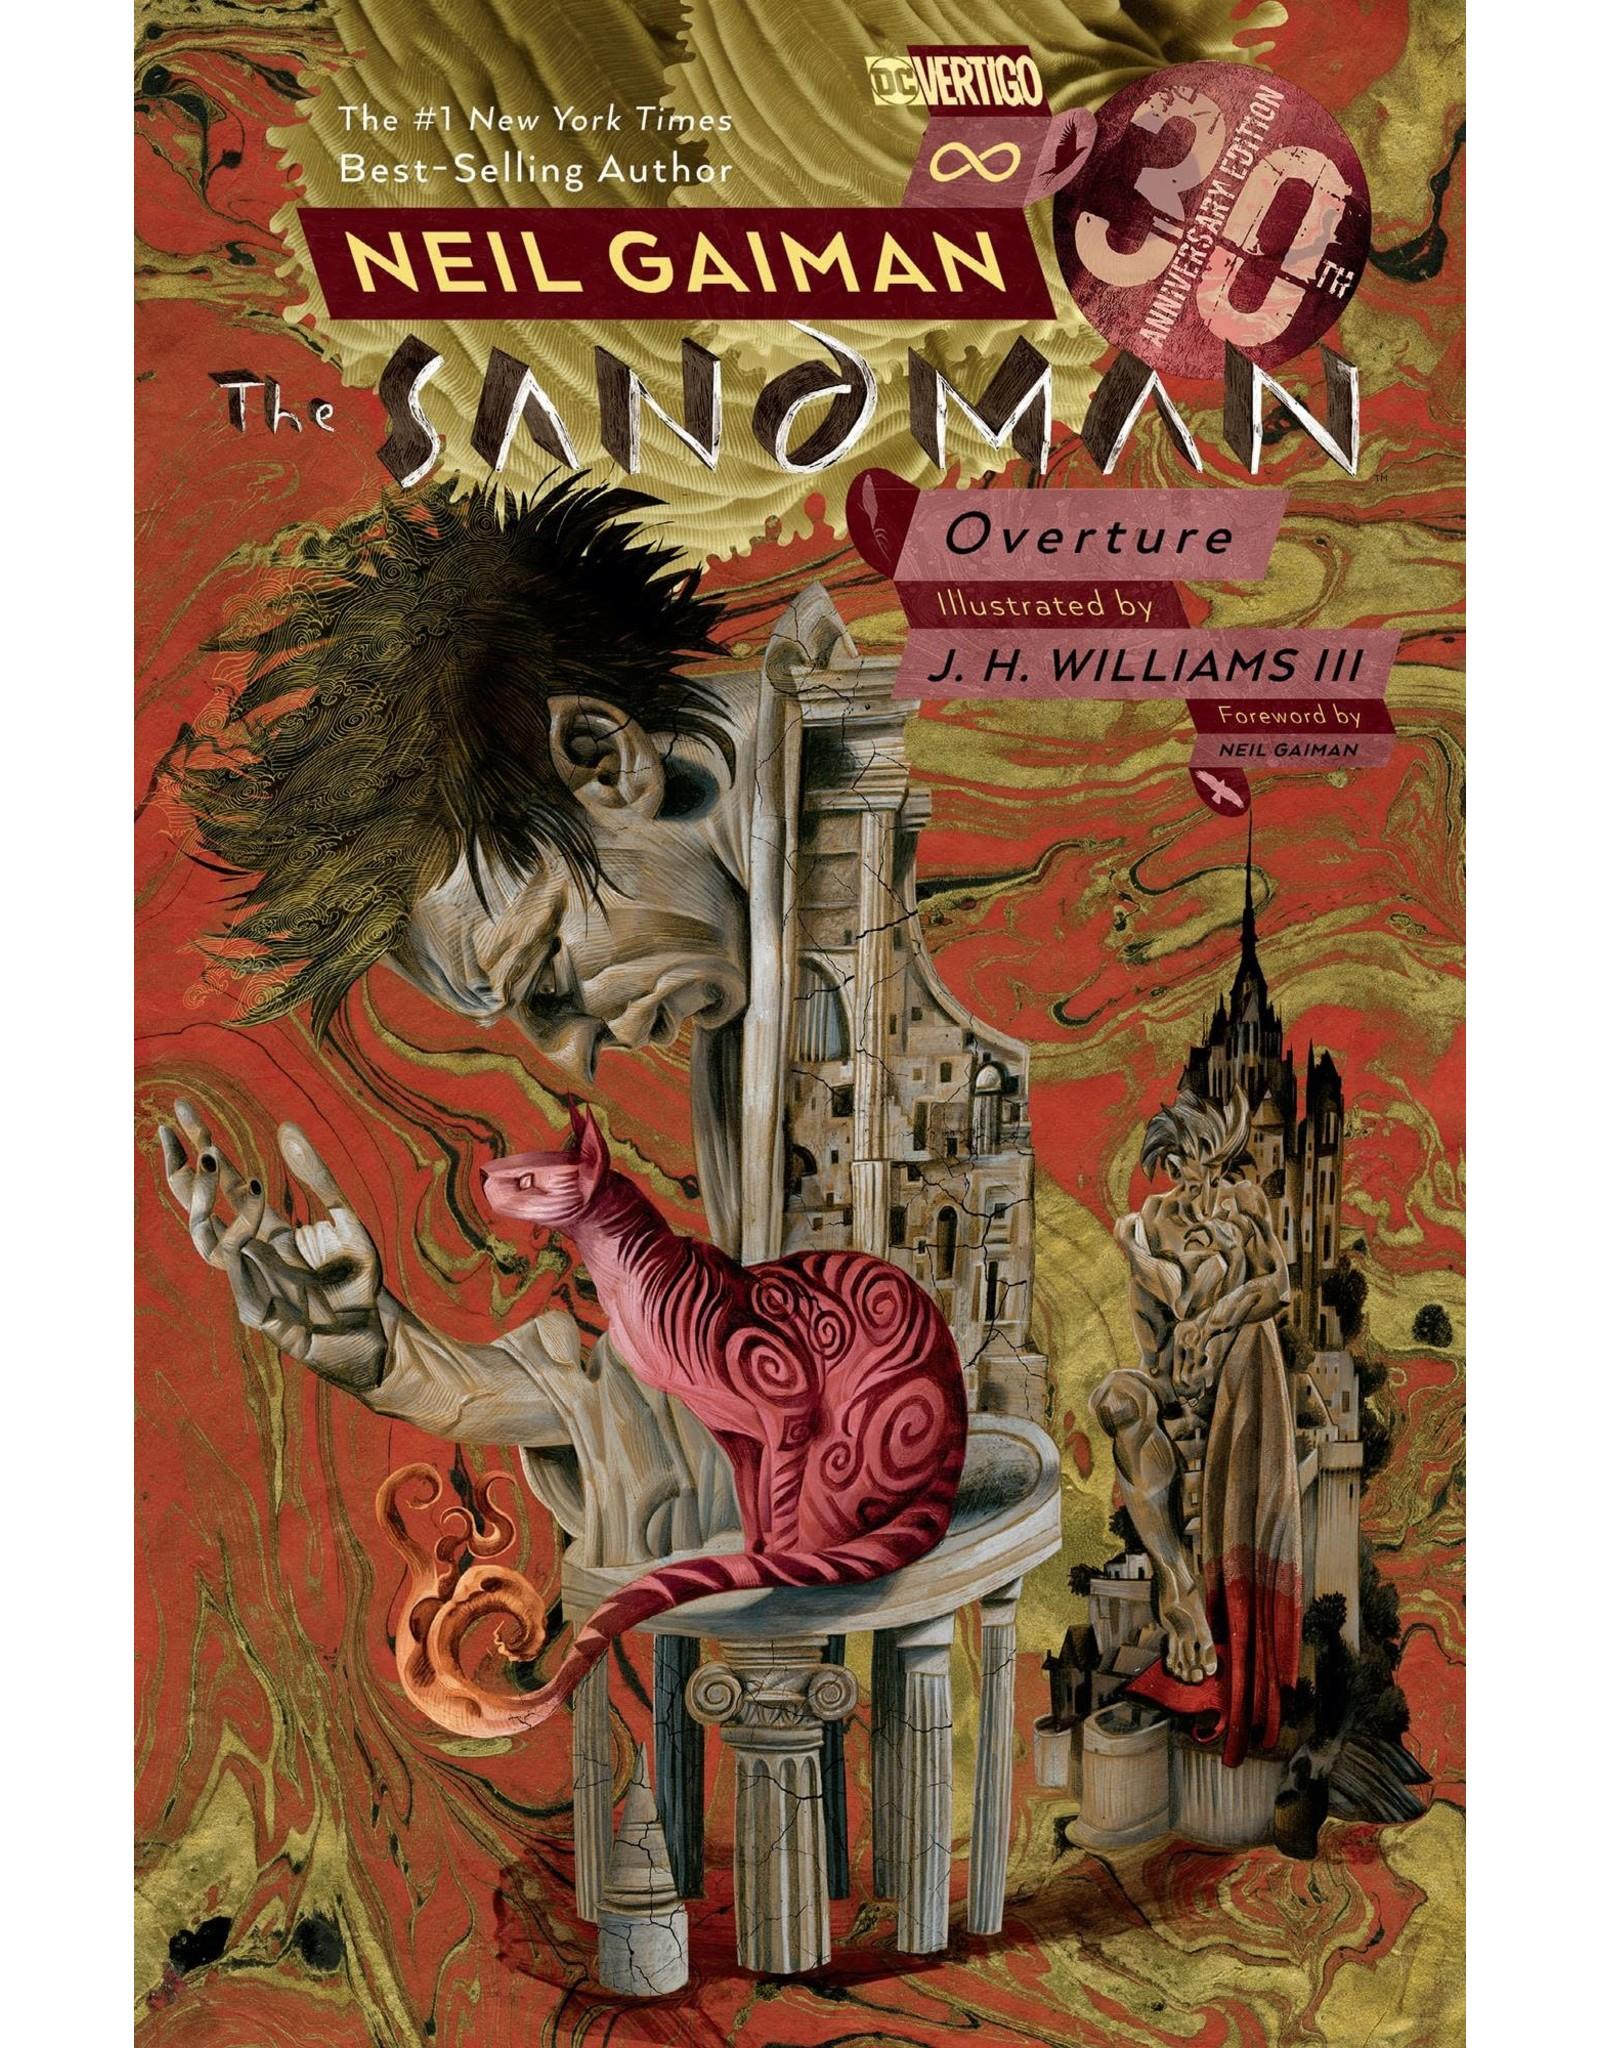 DC COMICS SANDMAN OVERTURE 30TH ANNIVERSARY EDITION TP